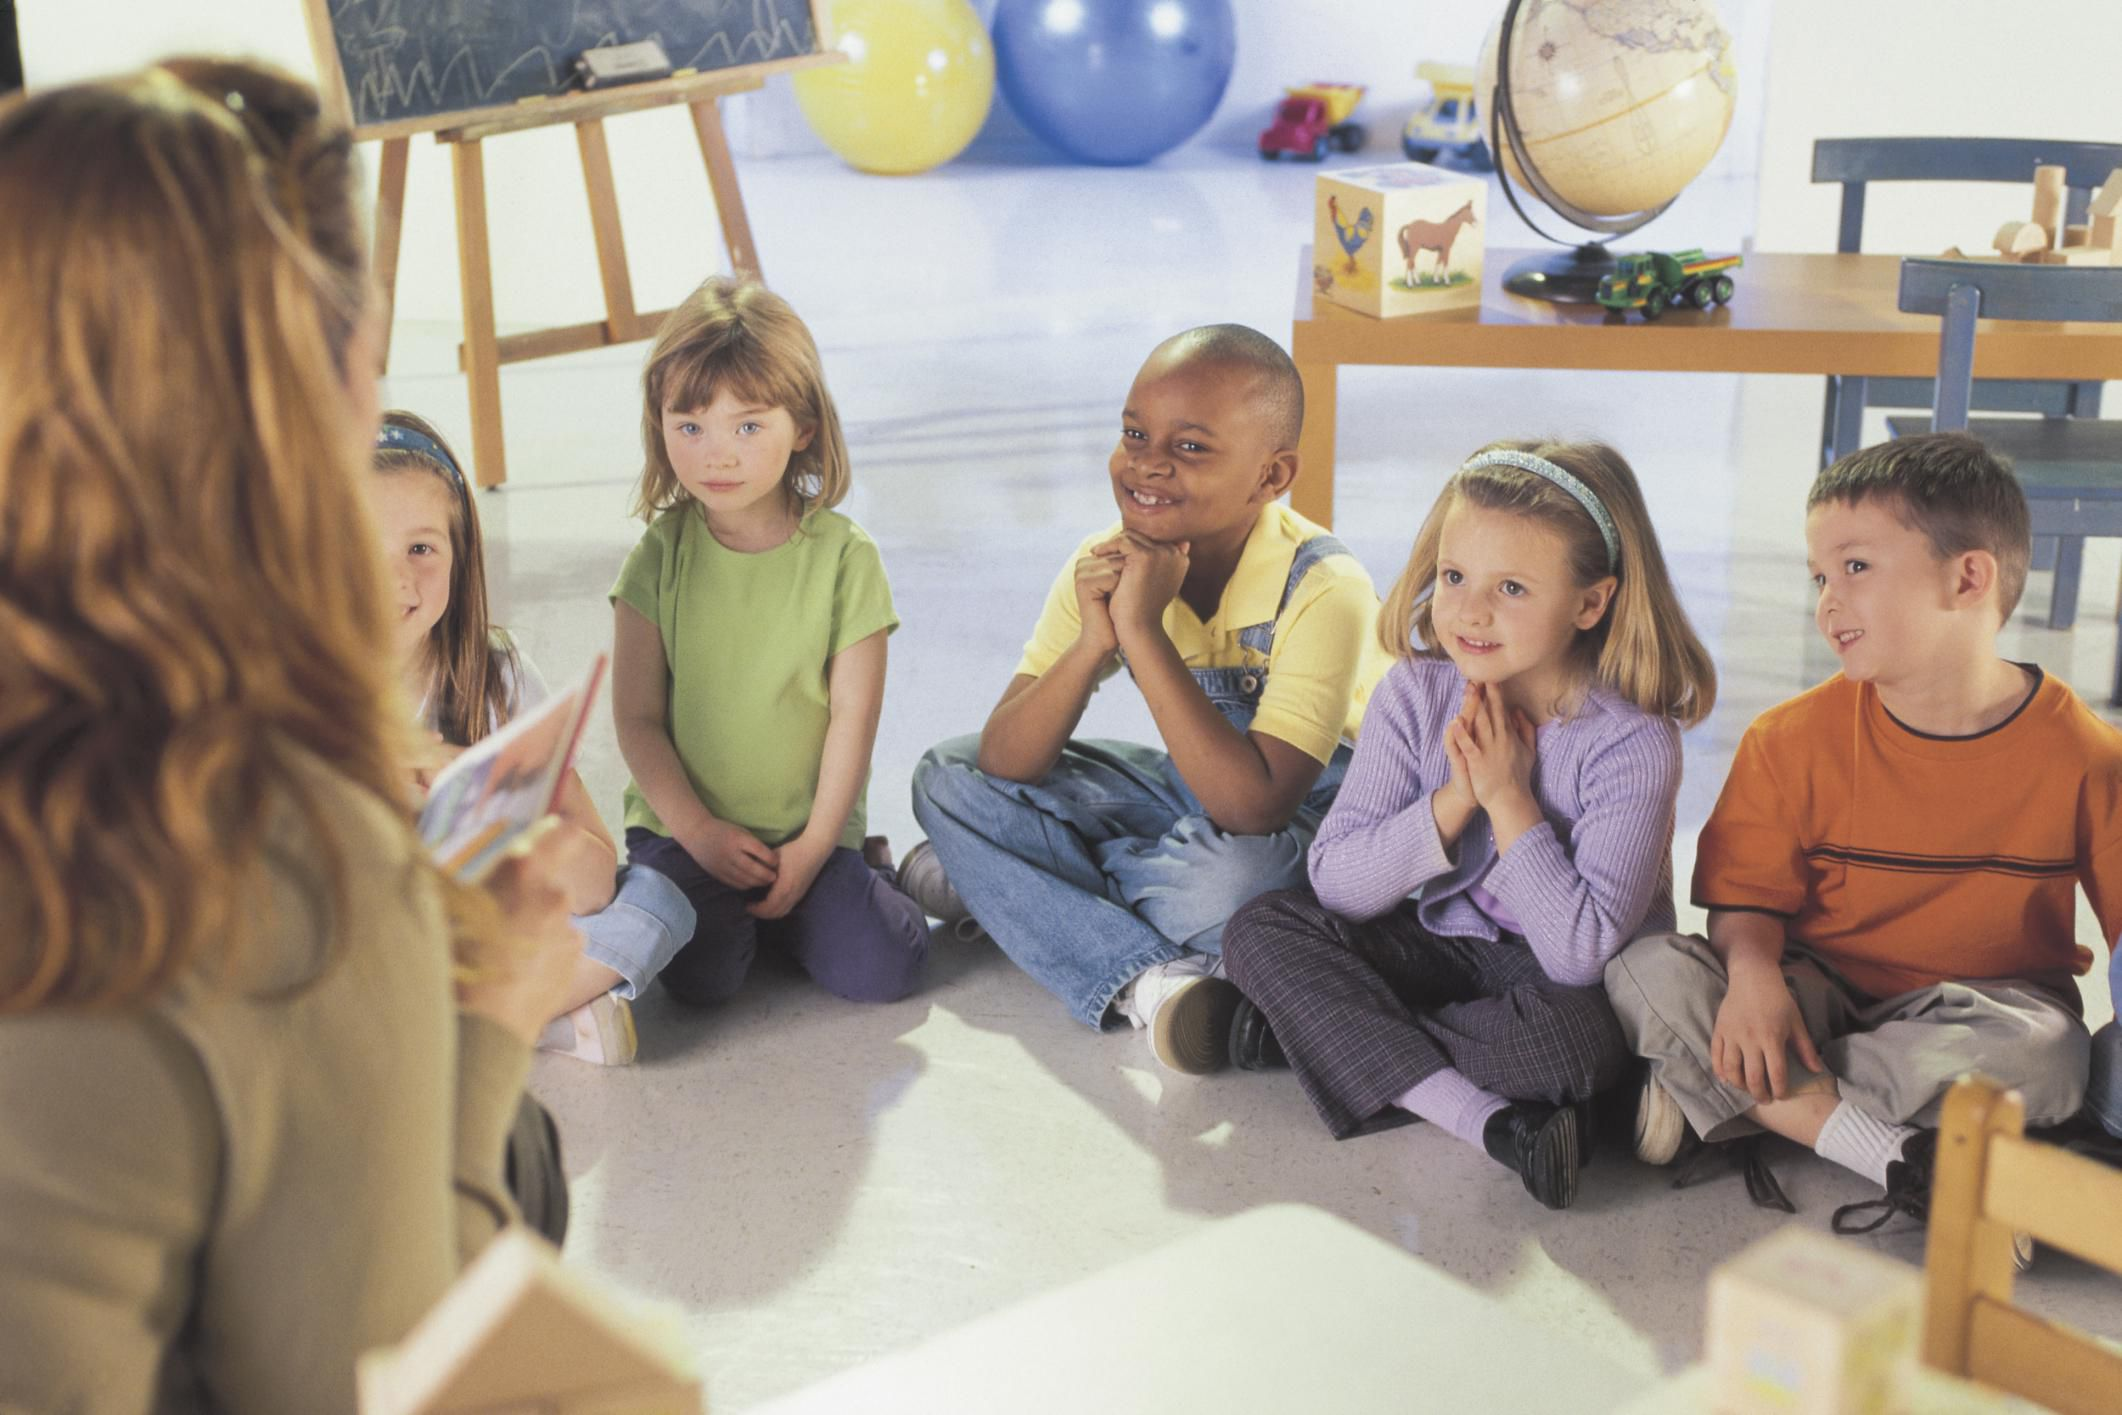 What Skills Do Kids Learn In Kindergarten